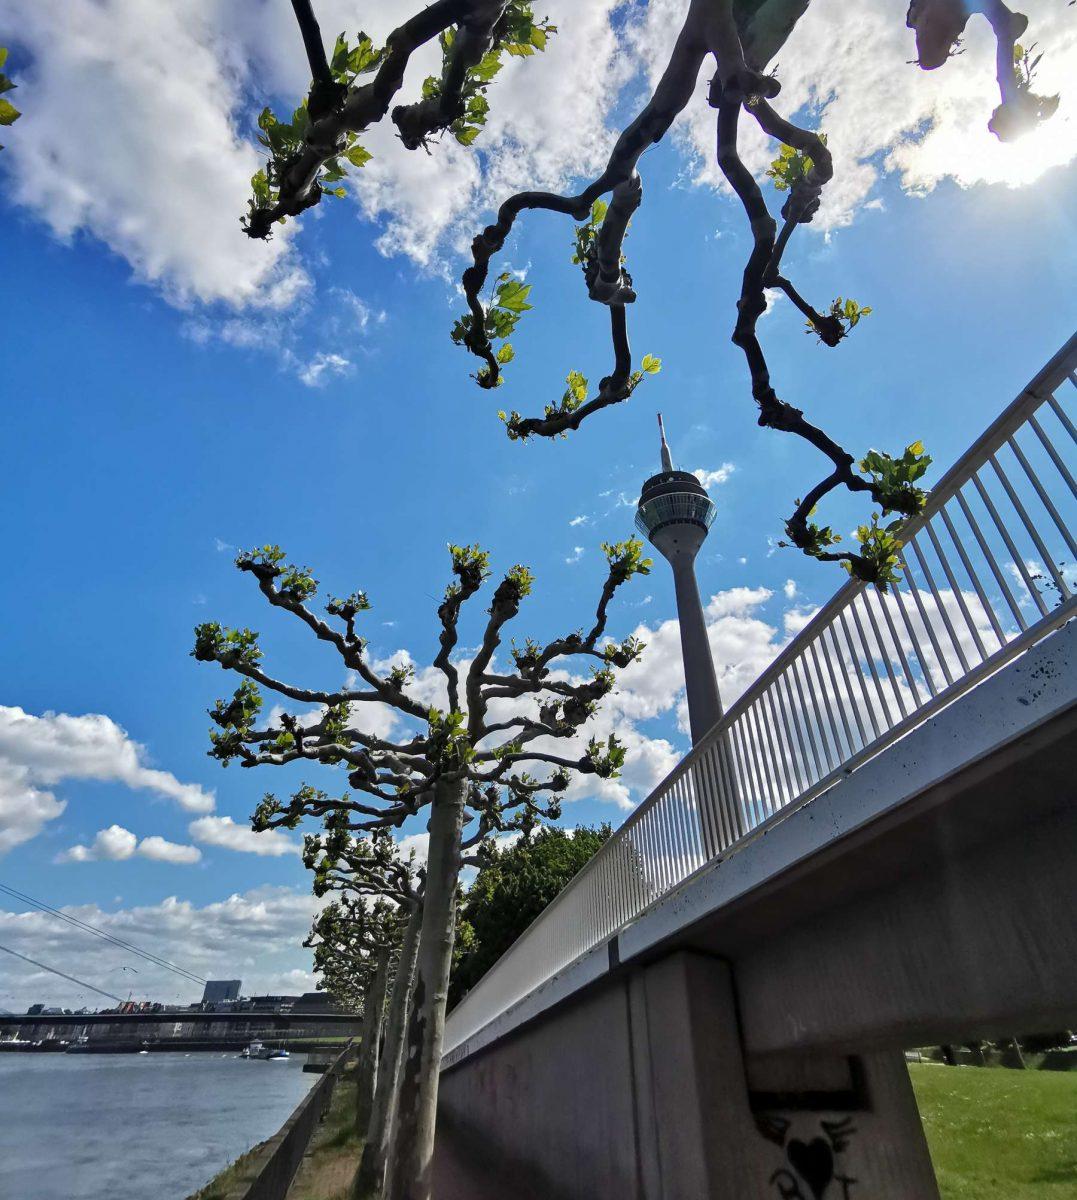 Frühlingshafte Impression des Rheintorturms am Rheinufer in Düsseldorf